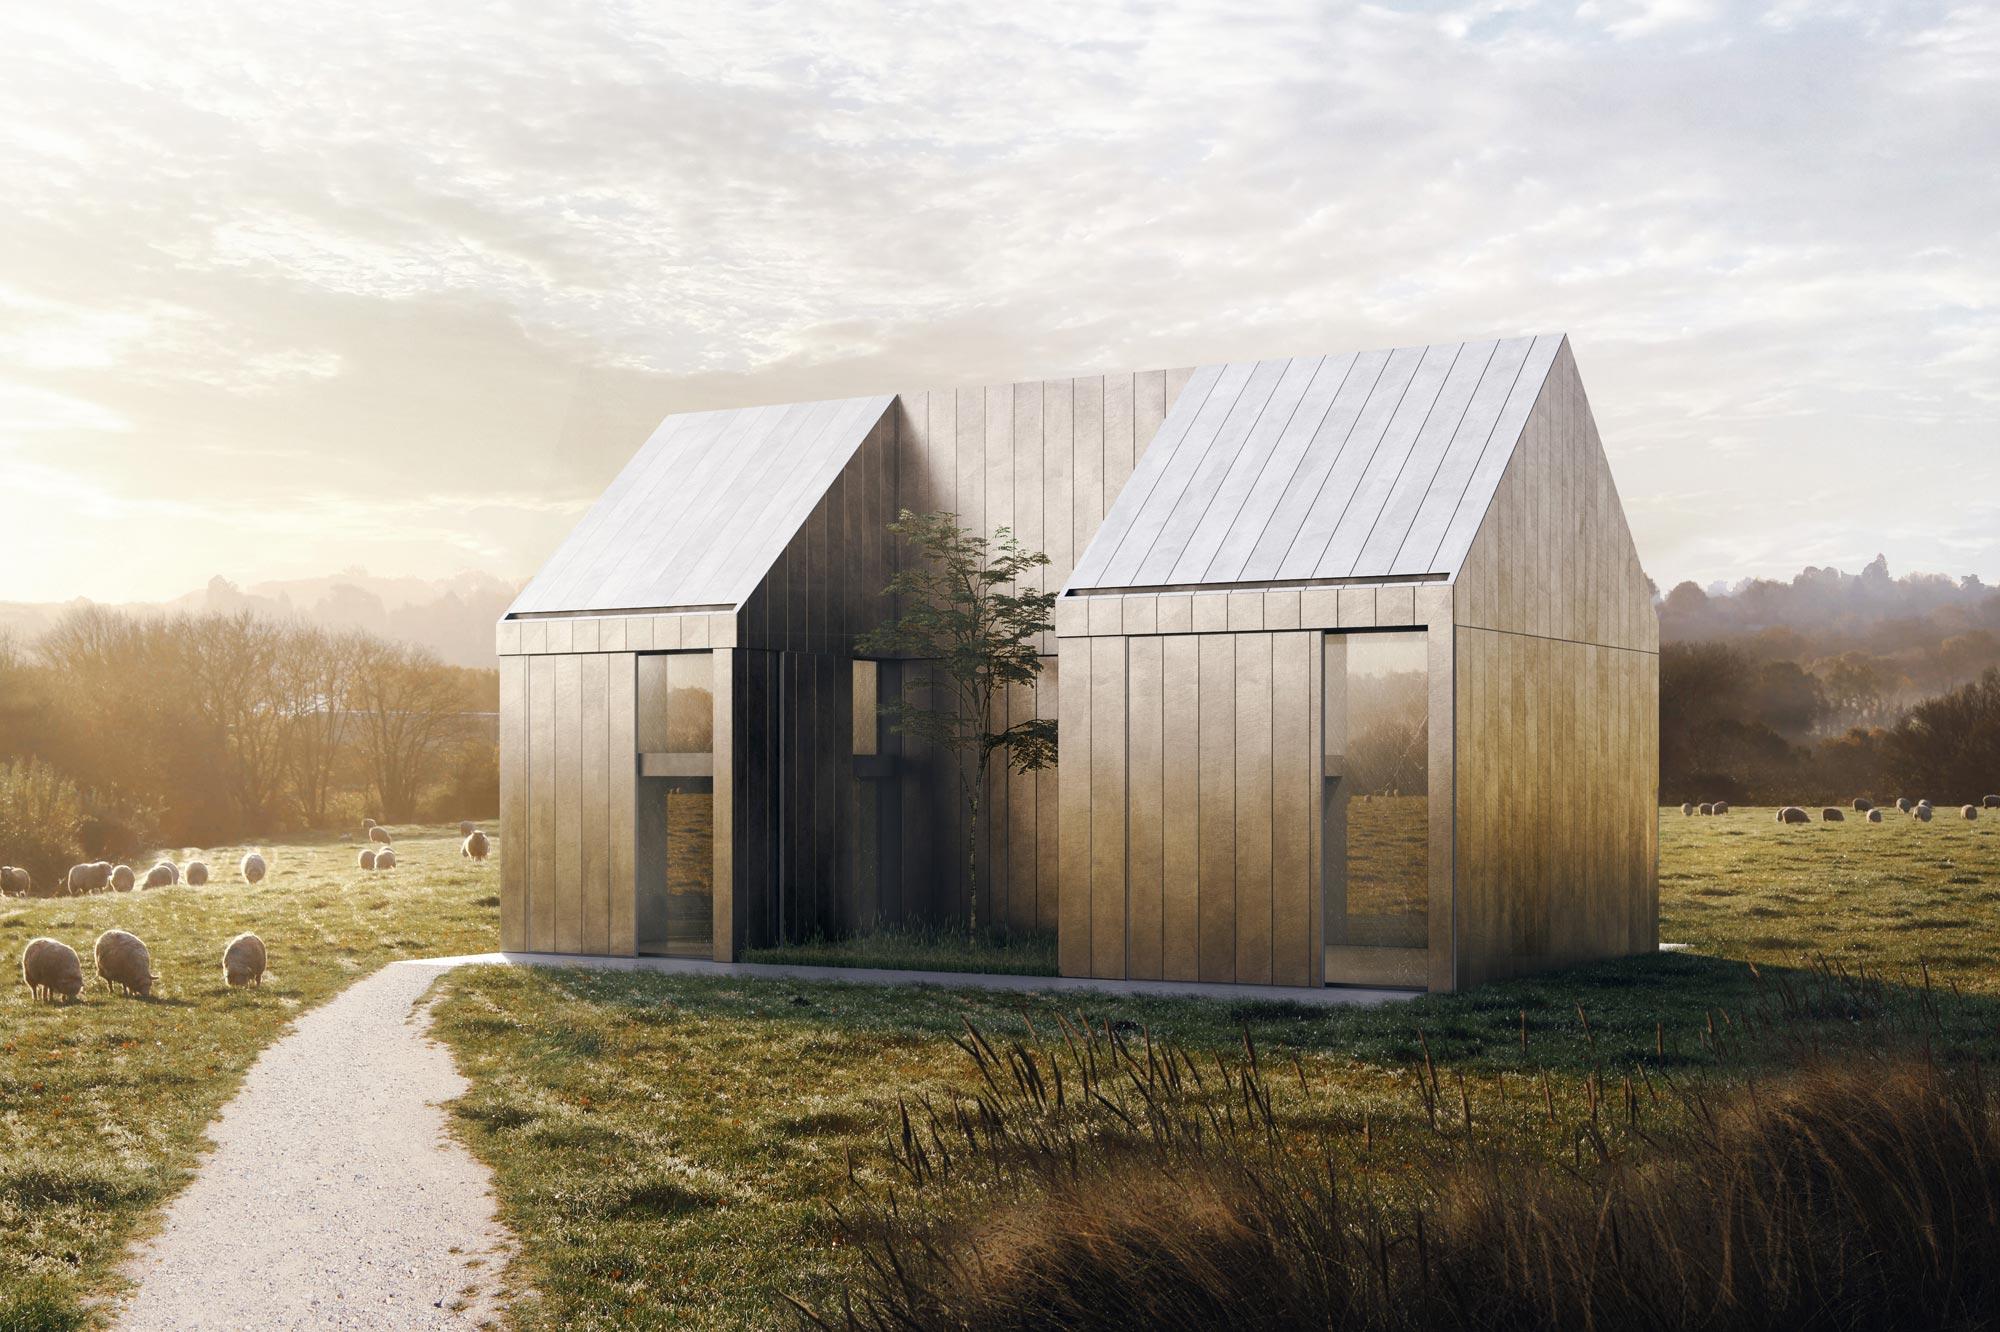 cube-haus-faye-toogood-architects-cs-2000px-02